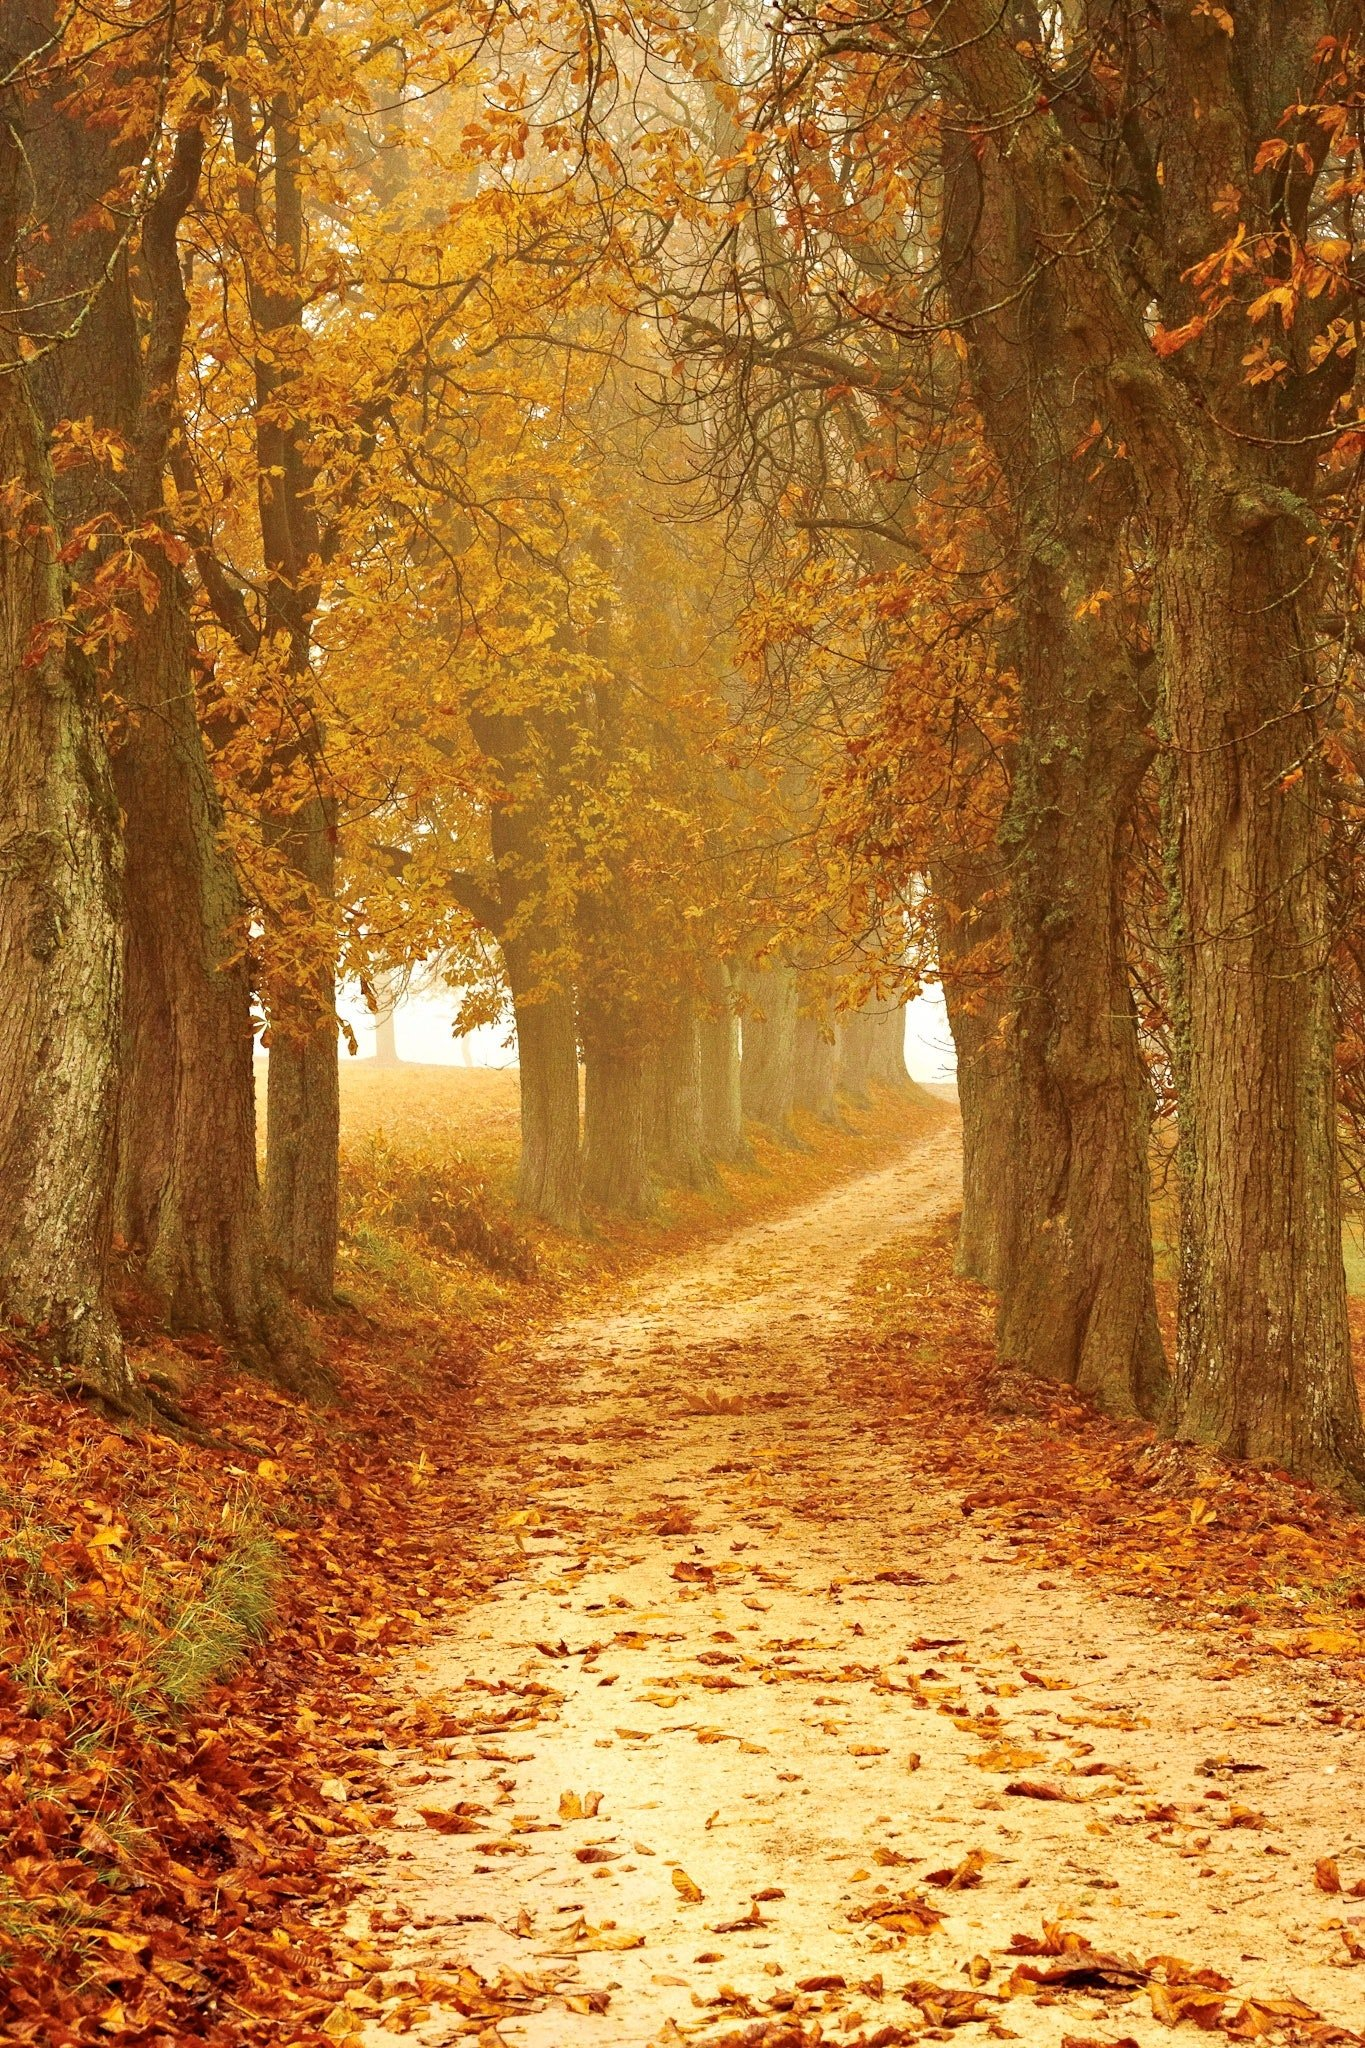 Autumn-forest-sunshine